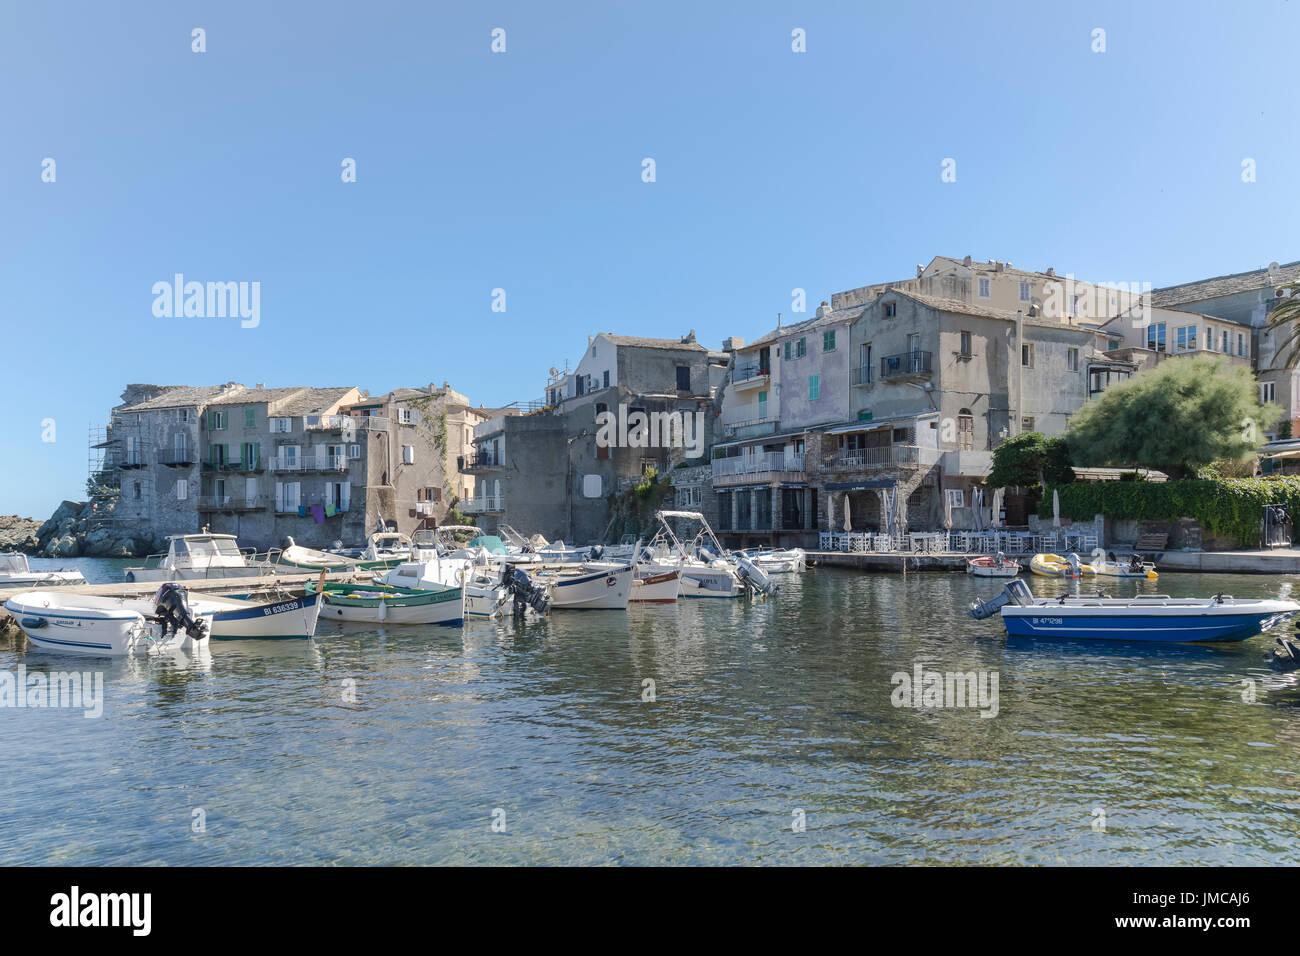 Erbalunga, Cap Corse, Corsica, France - Stock Image